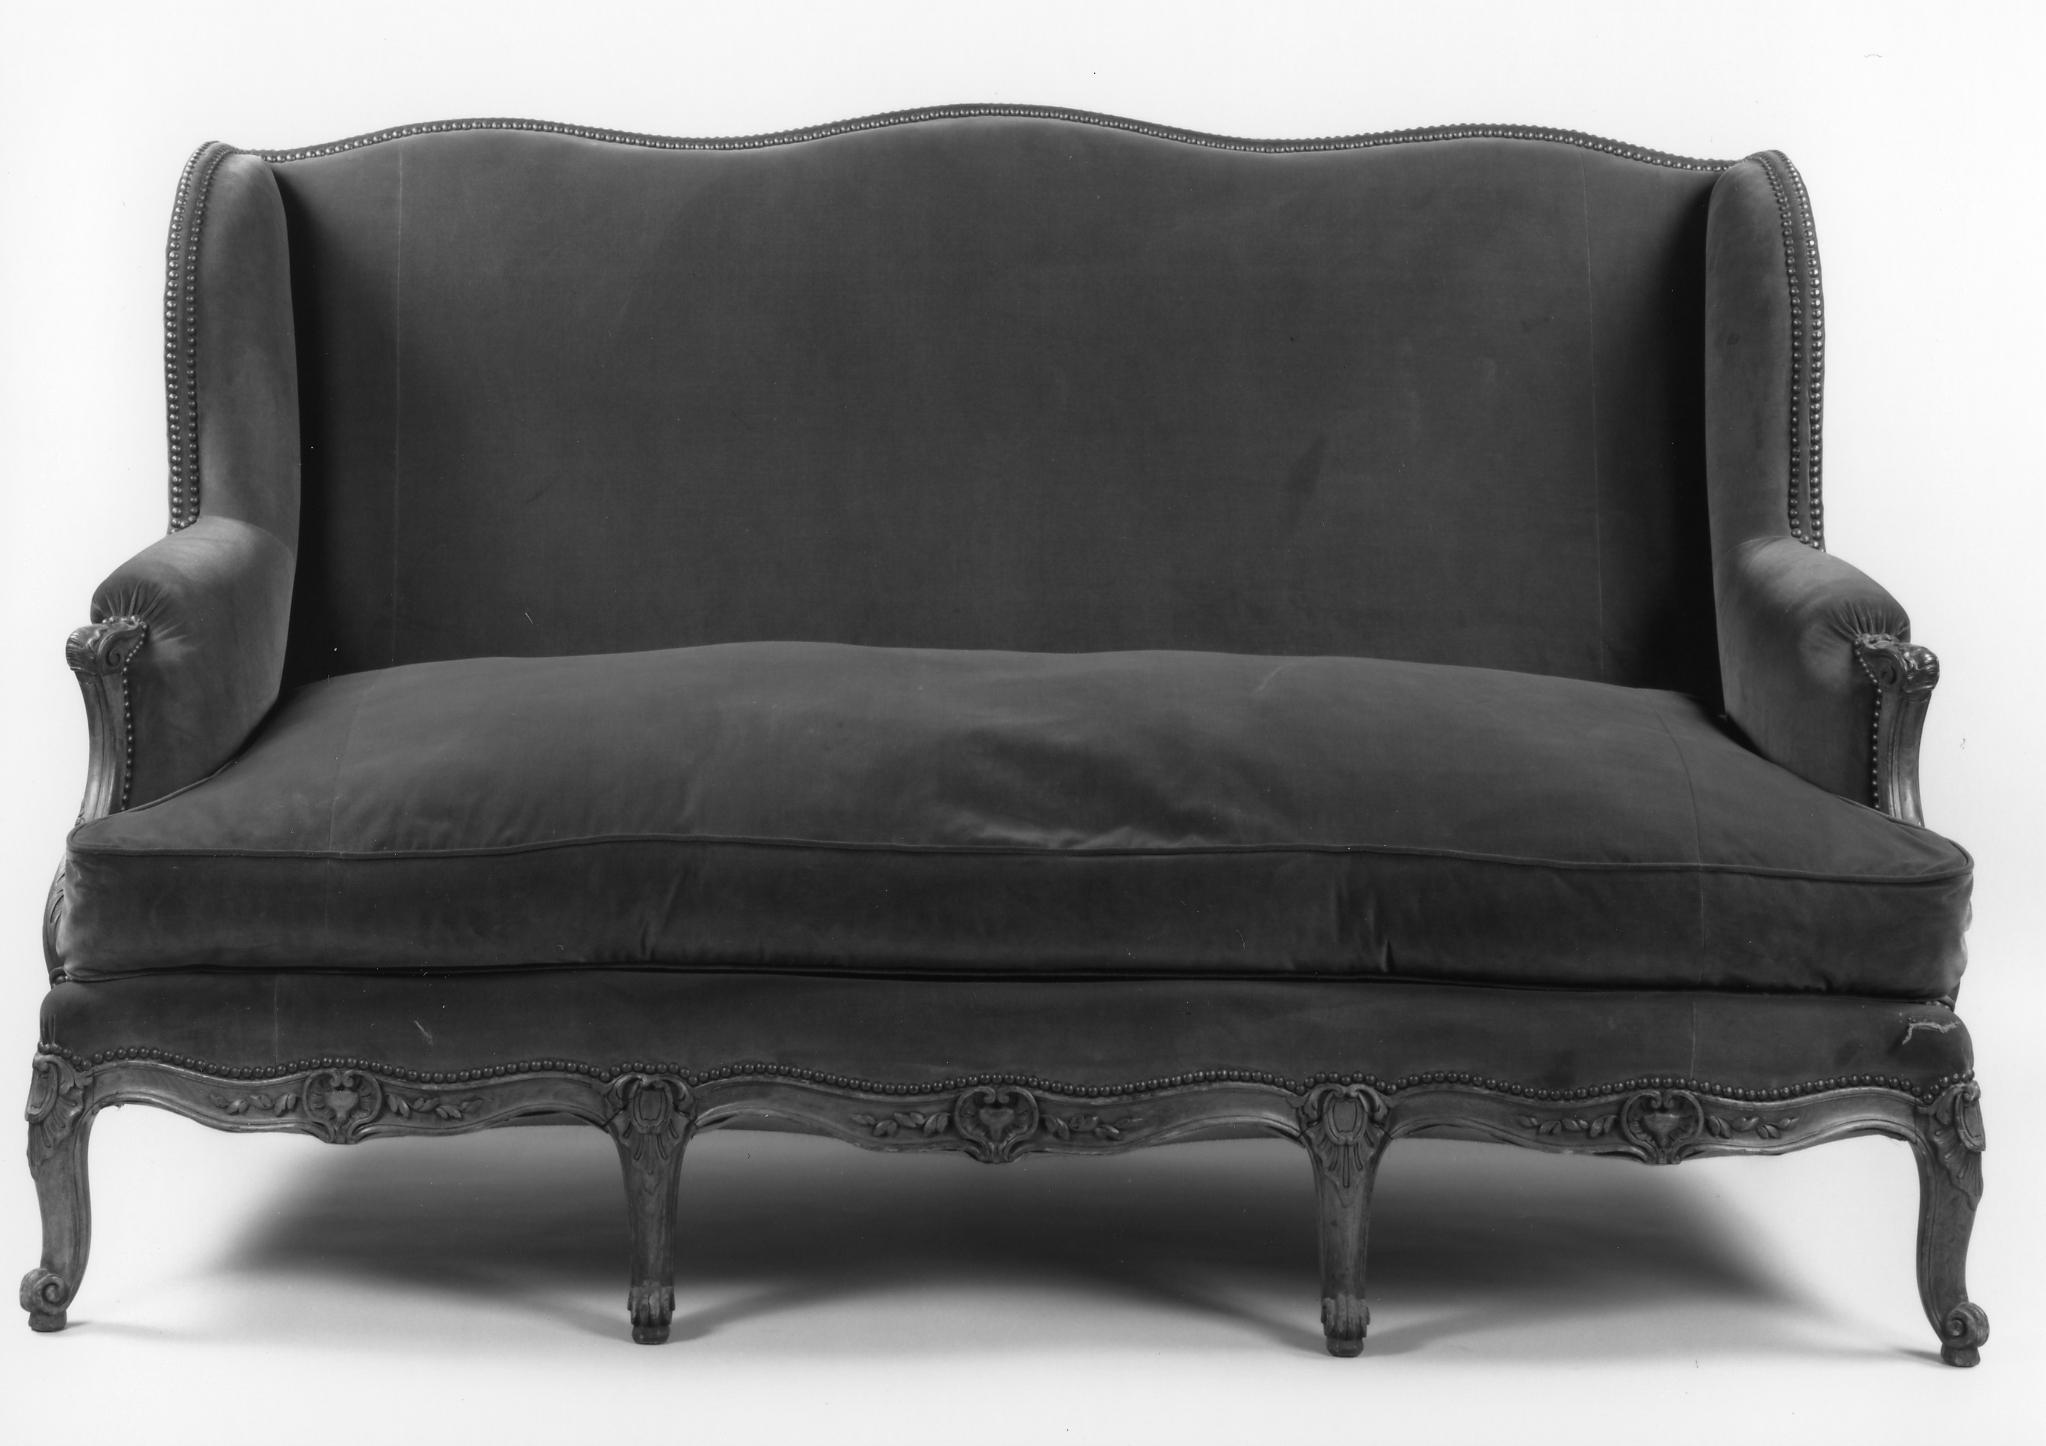 20 canapé Régence© Mobilier national